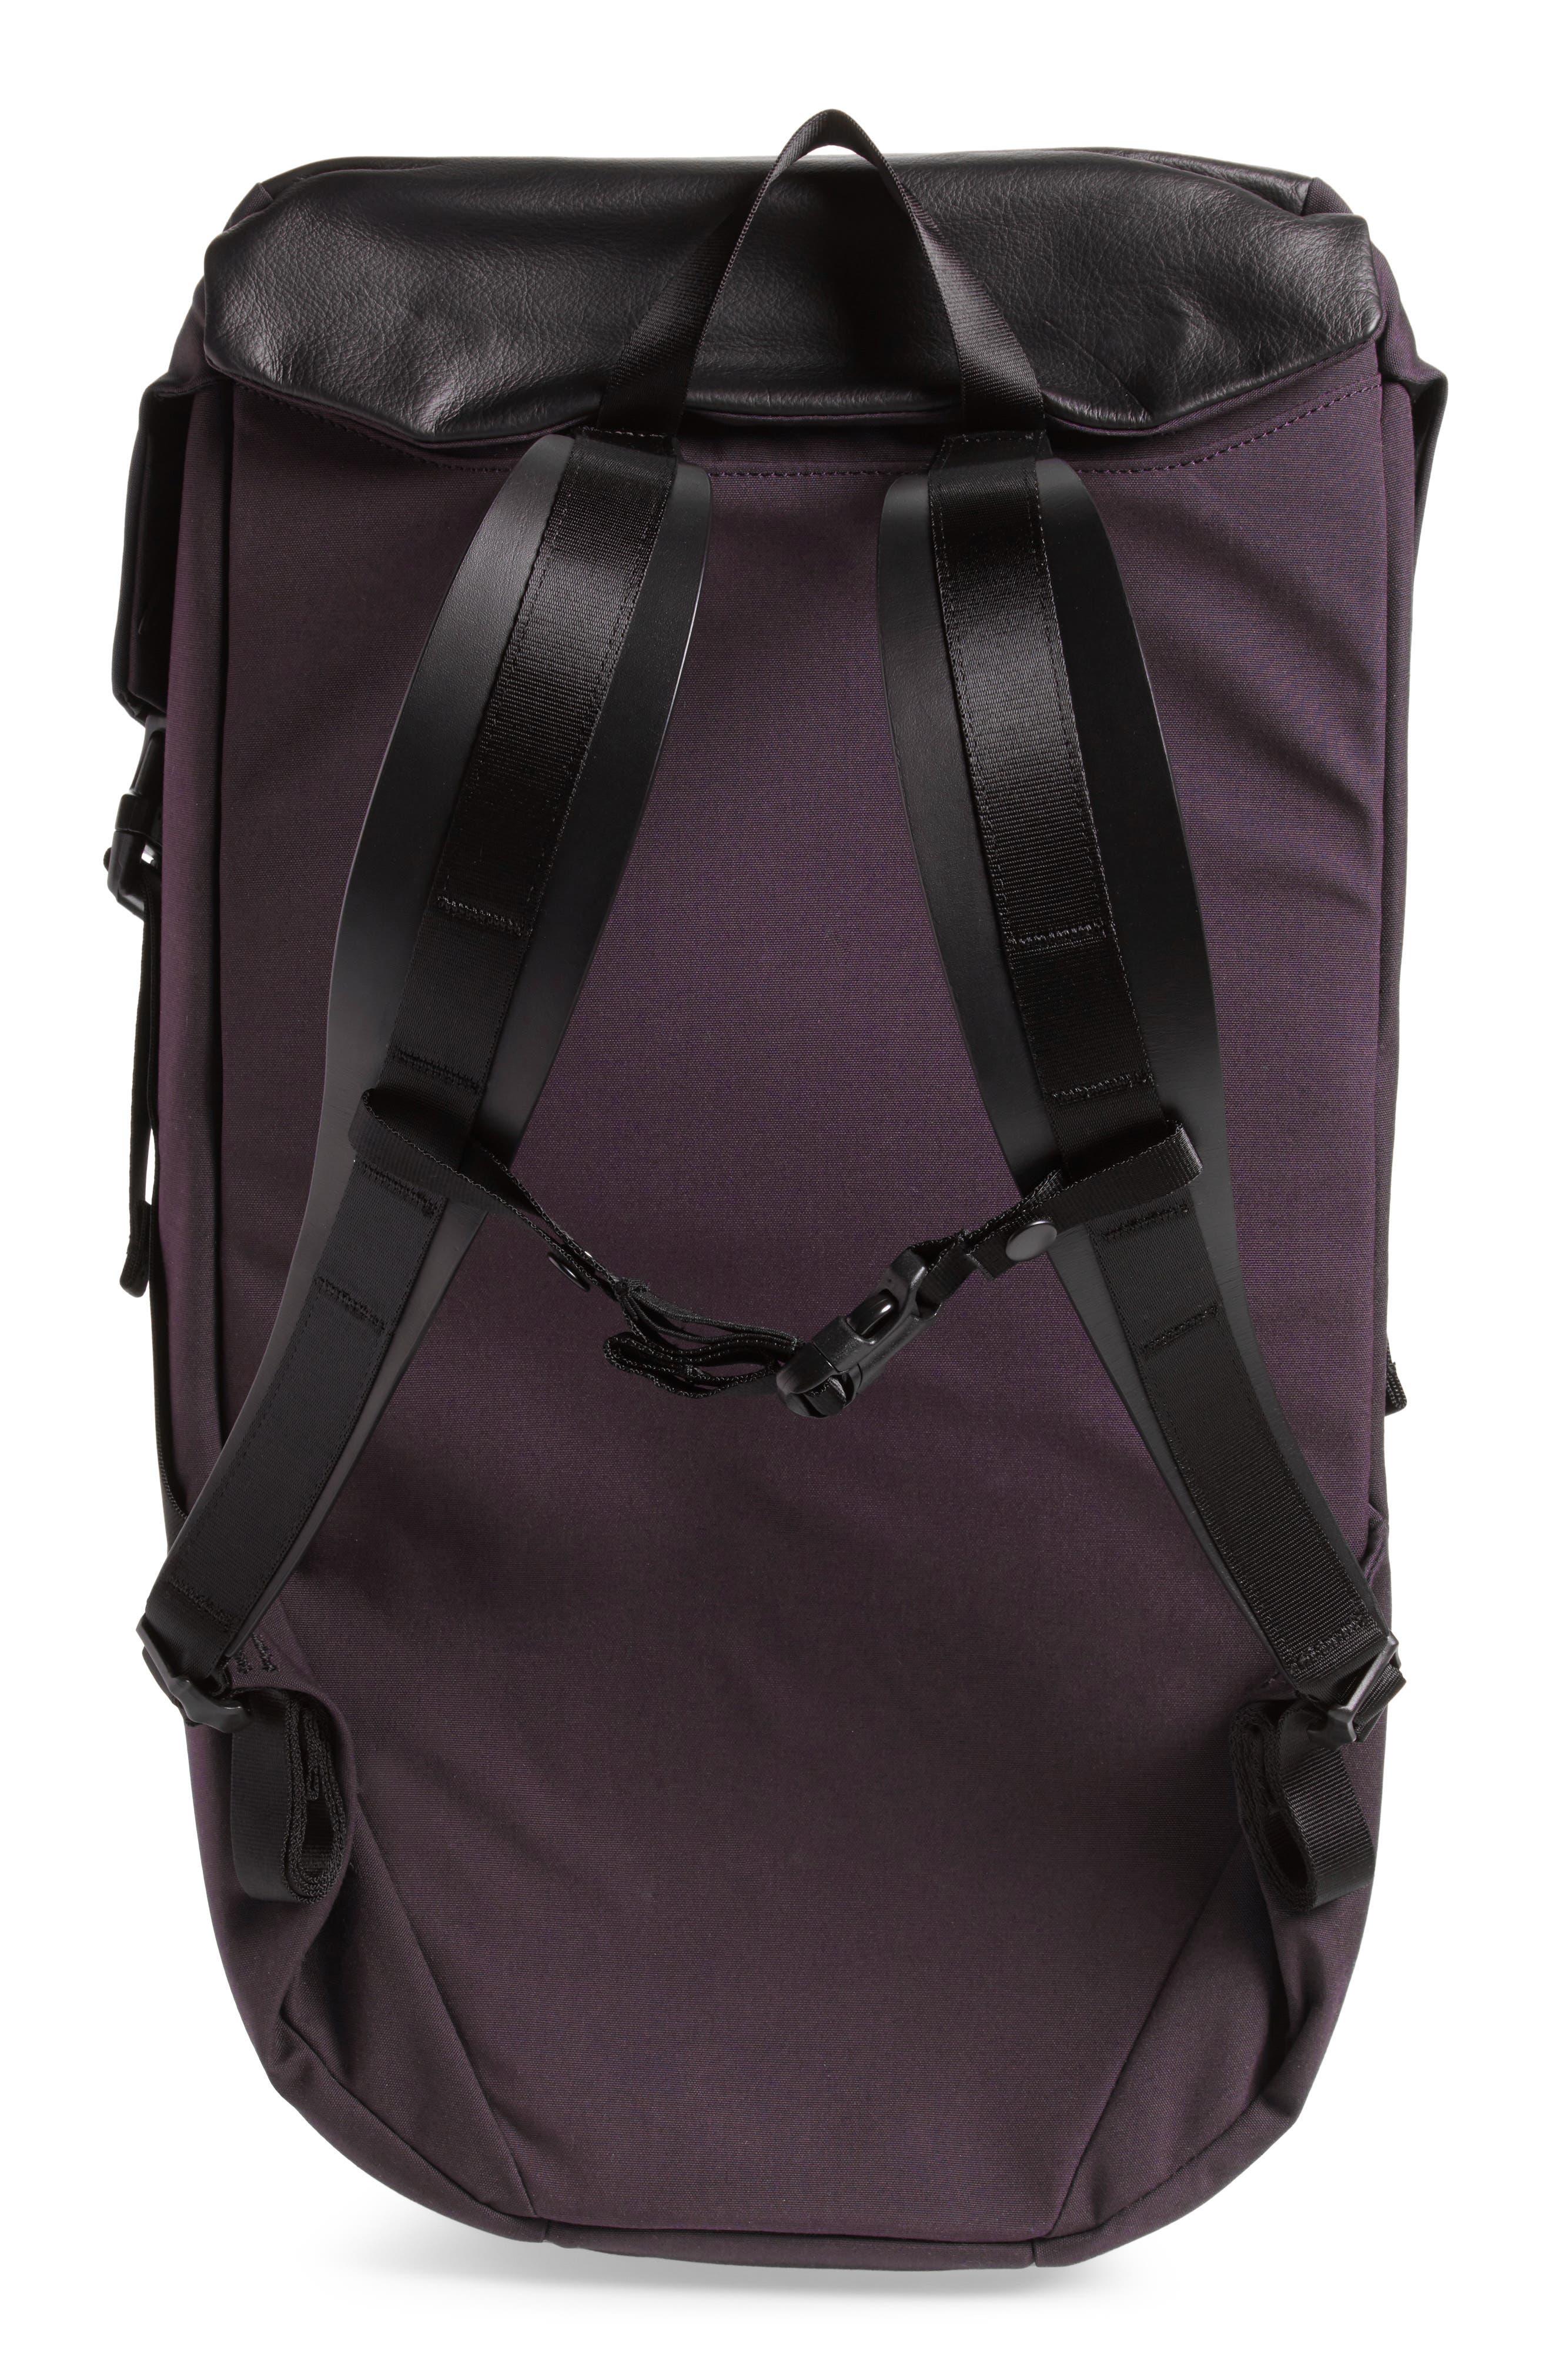 Locker Pack Lux Backpack,                             Alternate thumbnail 3, color,                             Port